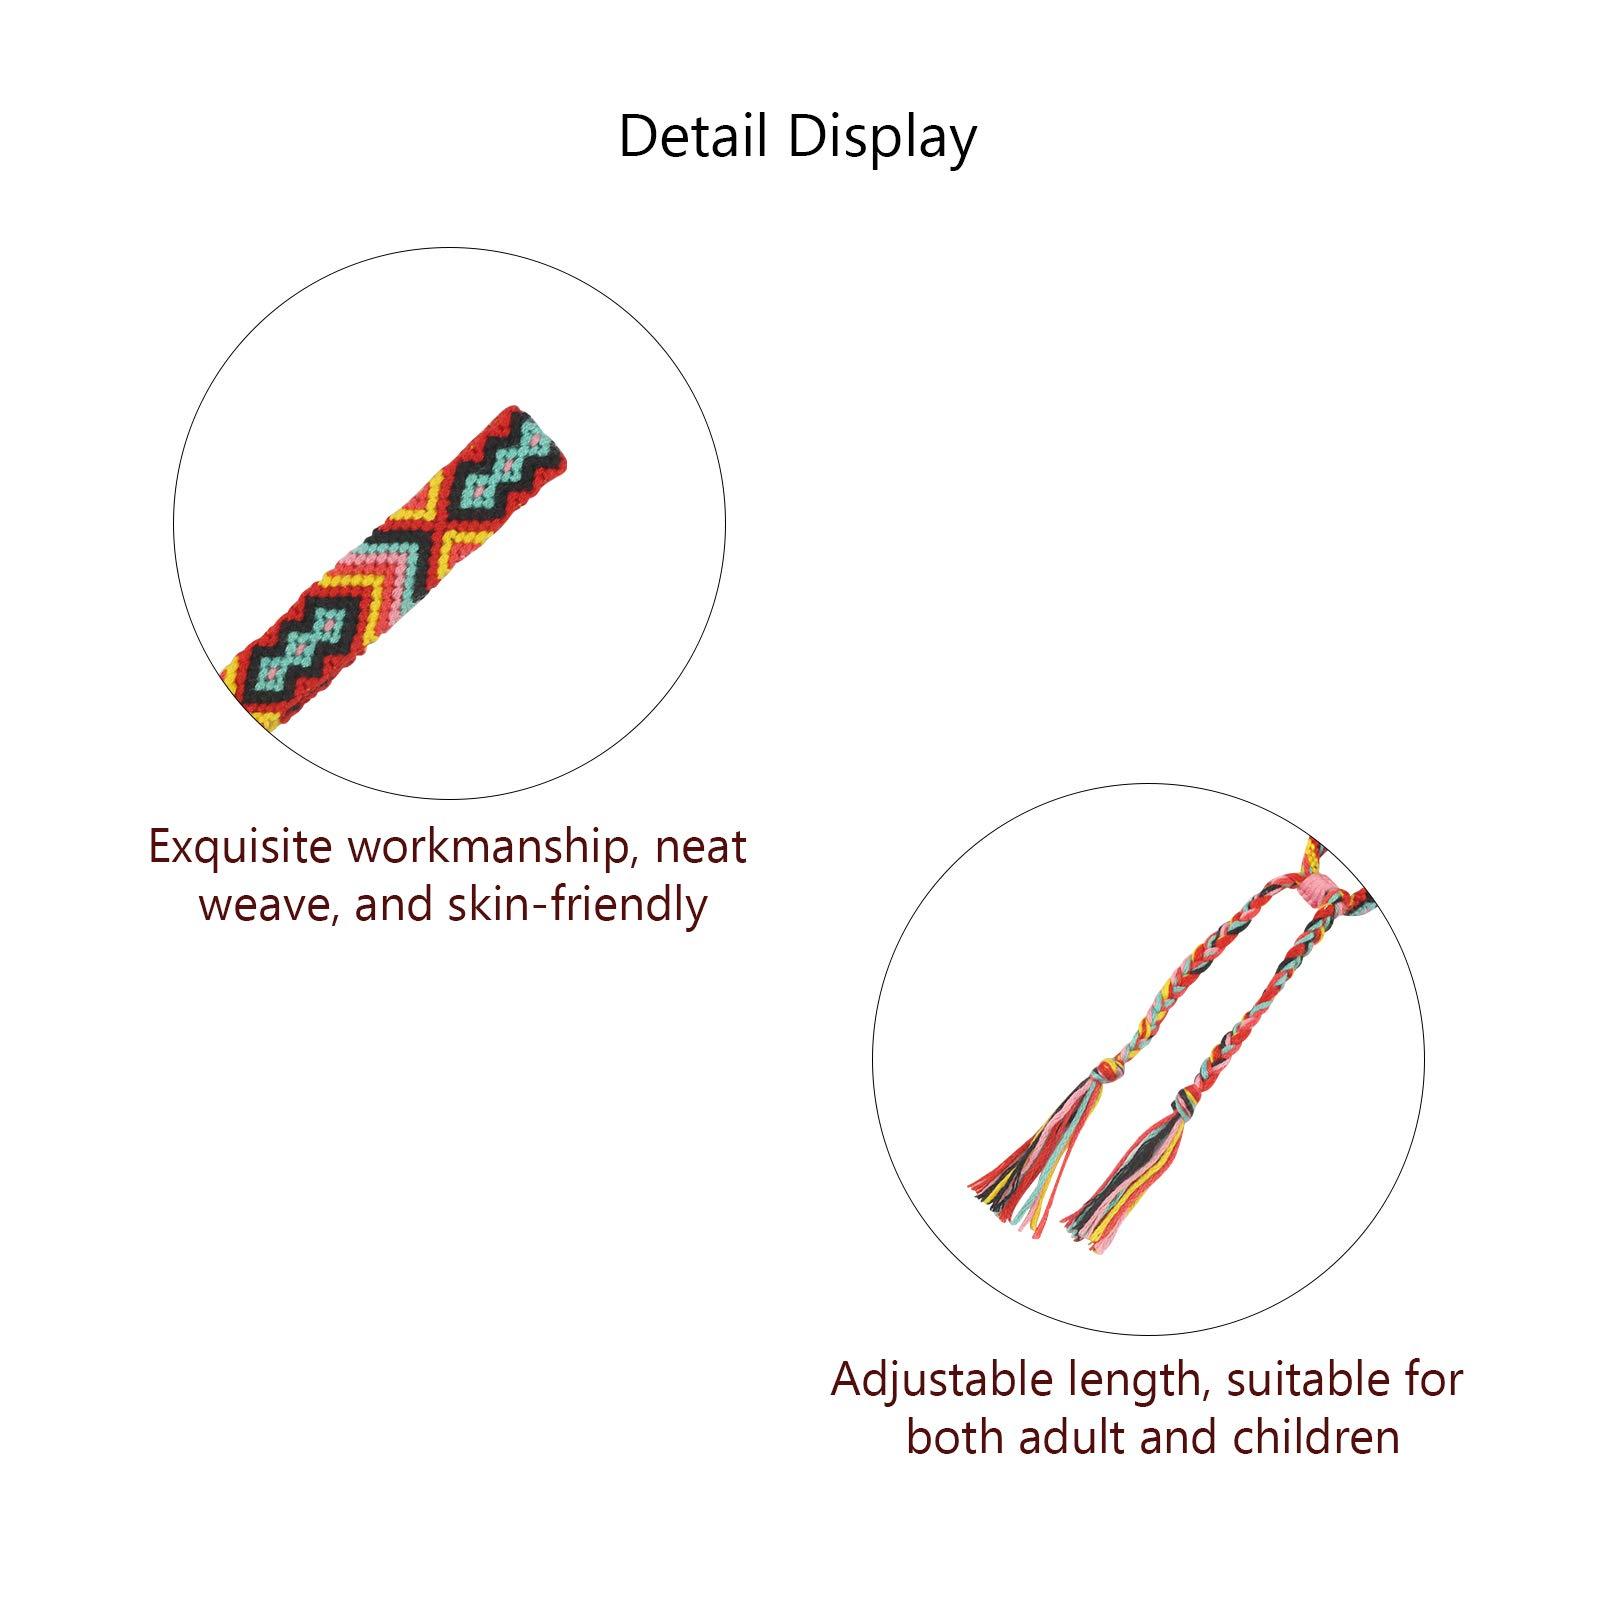 Matogle 8pcs Wrist Woven Bracelets Nepal Braided Bracelet Handmade Friendship Bracelets in Multi Colors for Girl Women Teenagers